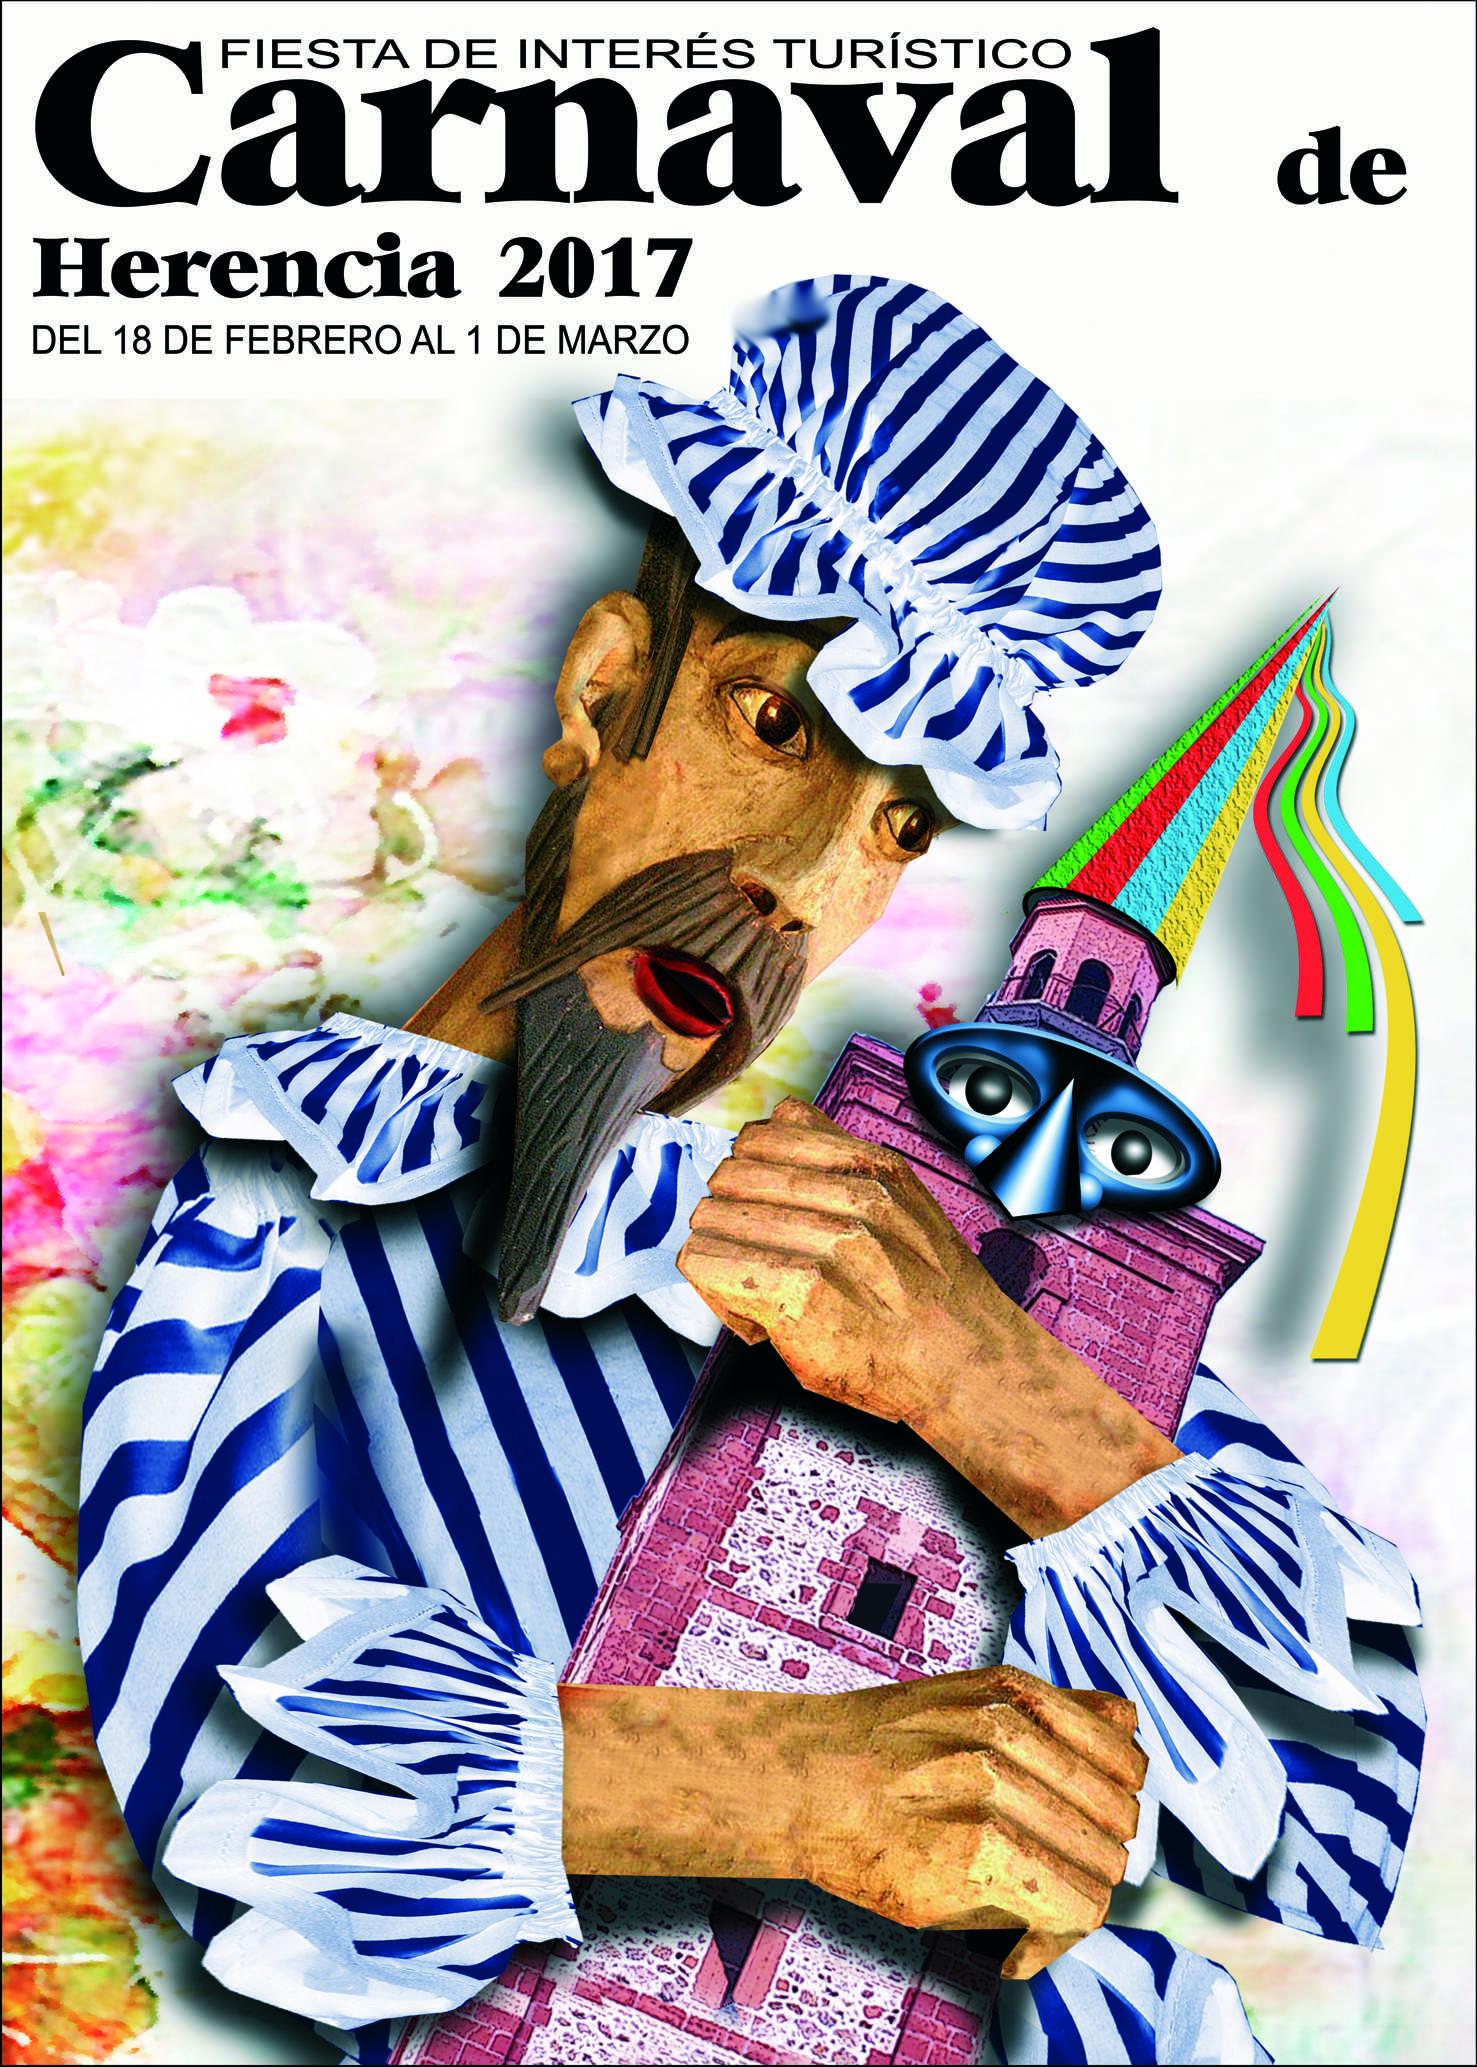 cartel de carnaval de herencia 2017